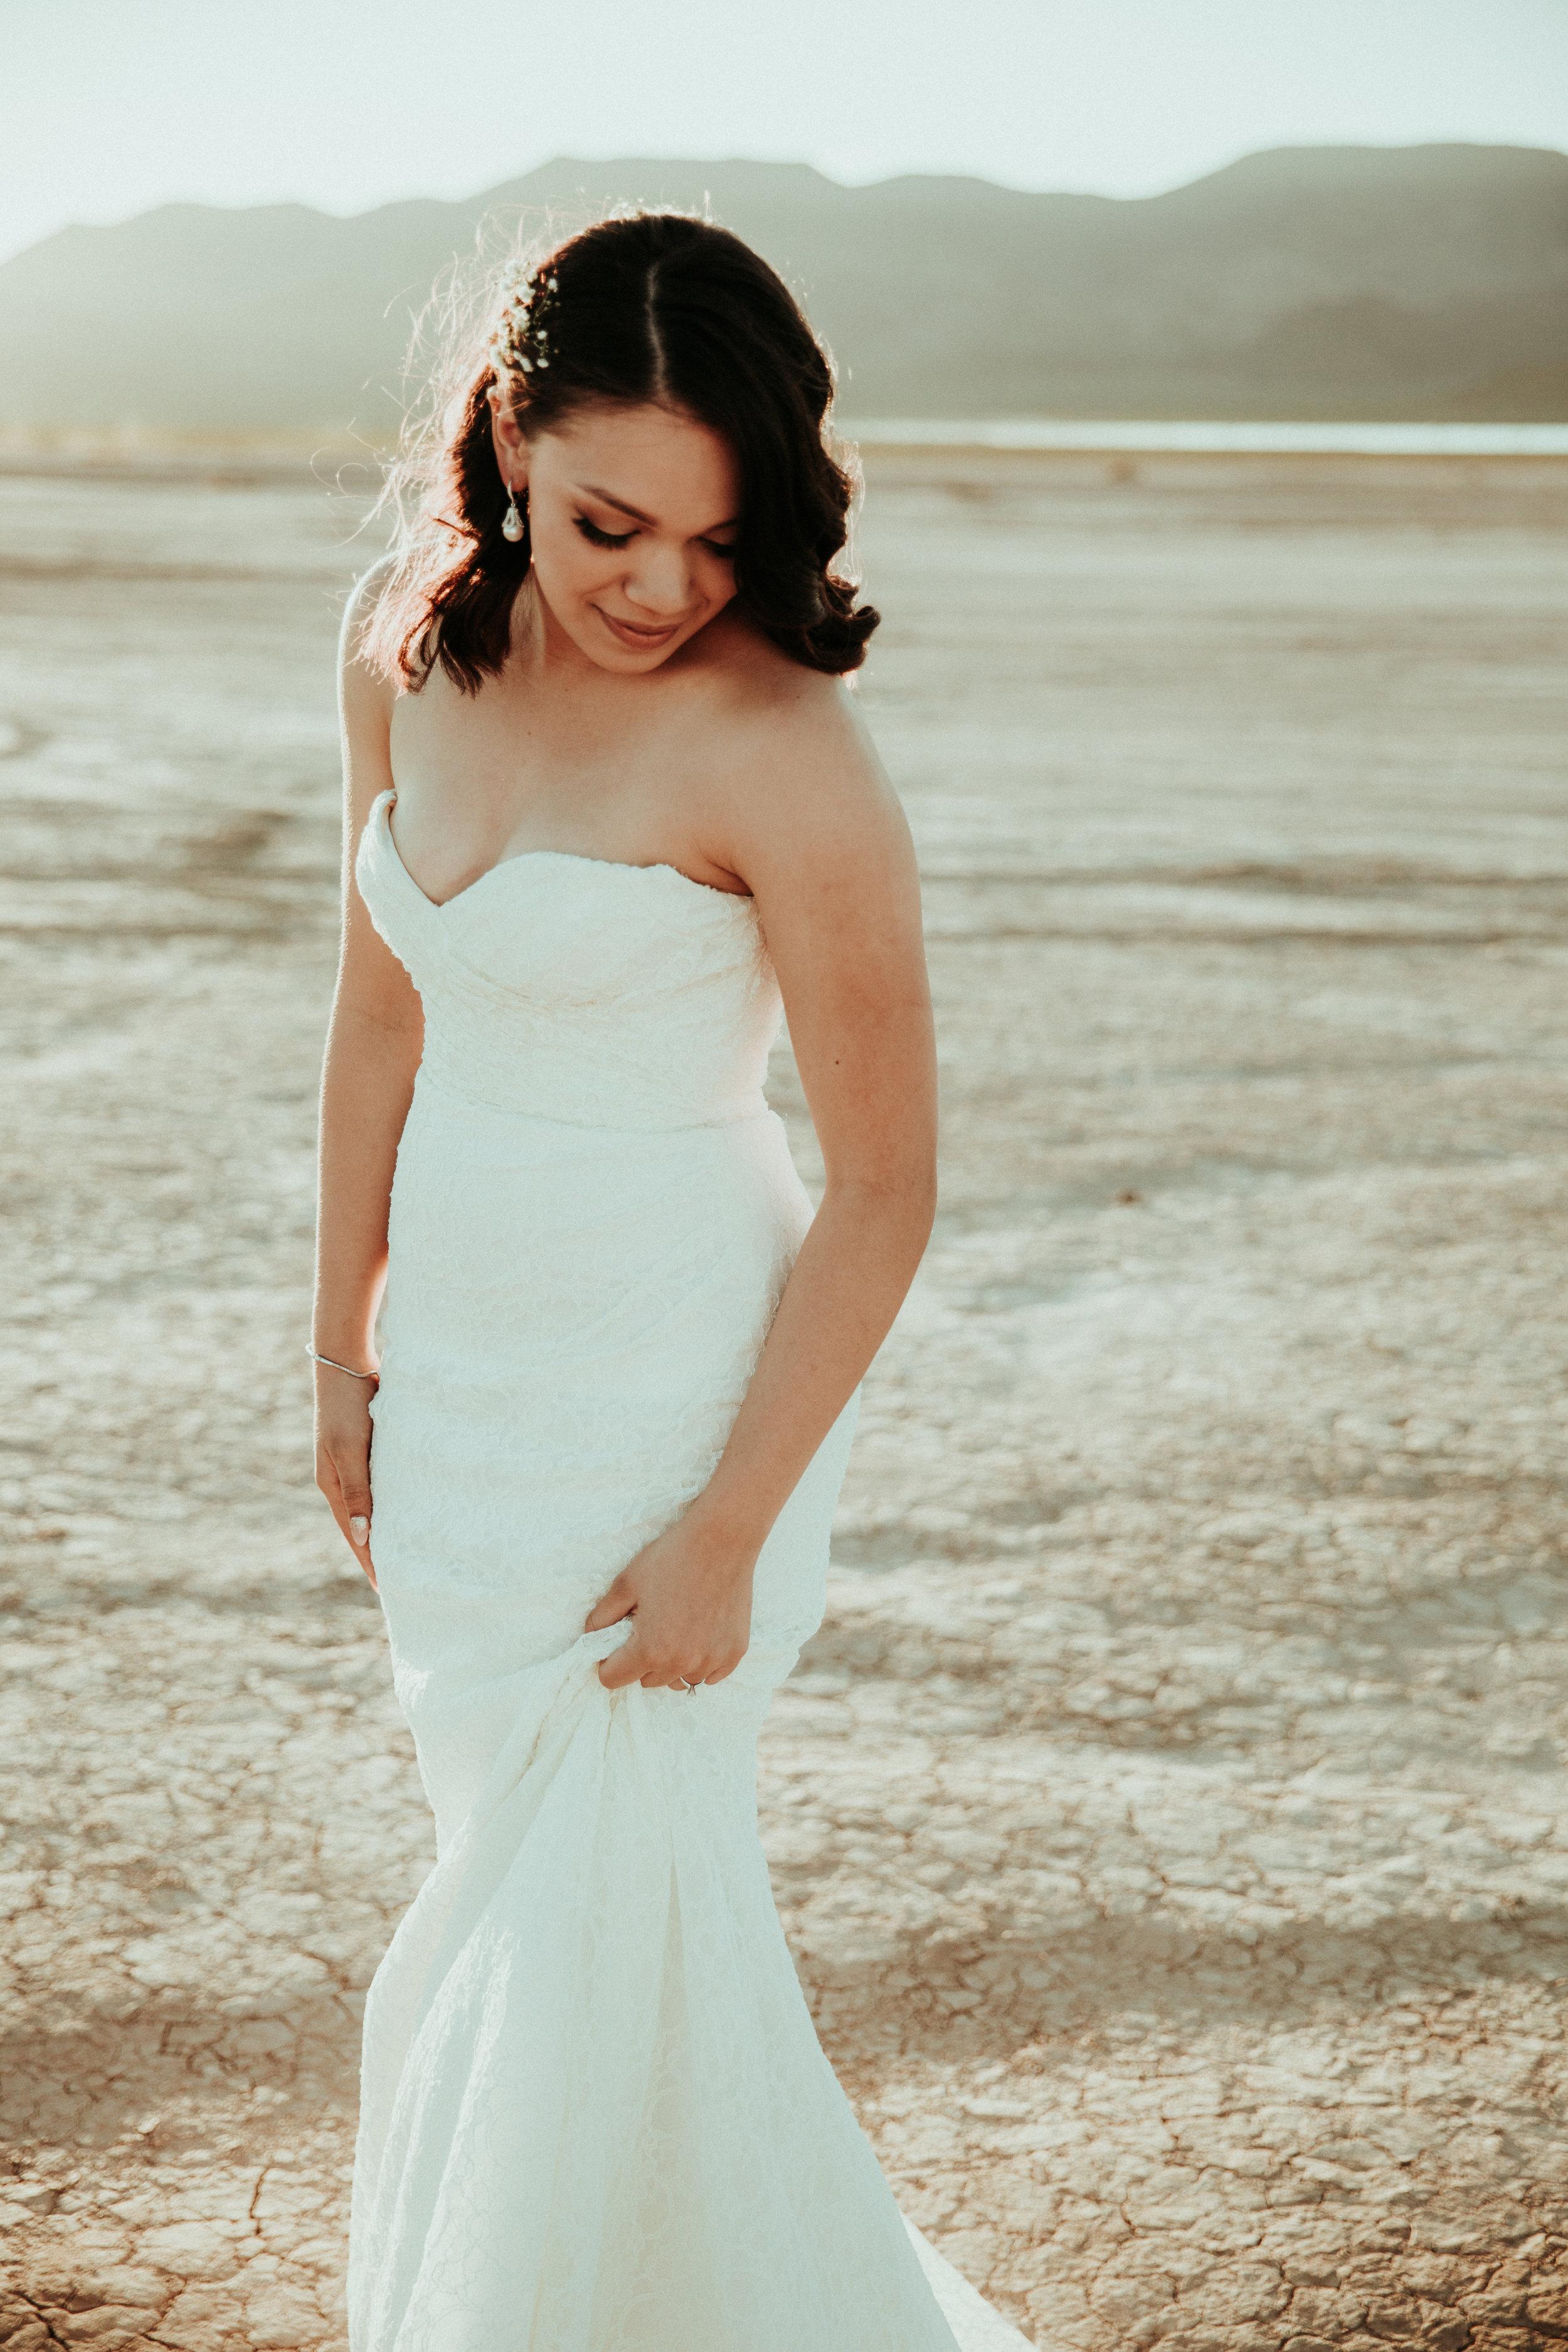 Bridal Portrait - Bride - First Look - Las Vegas Wedding Photographer - Seattle Wedding Photographer - PNW Elopement Photographer - Henderson, NV - Portland Wedding Photographer